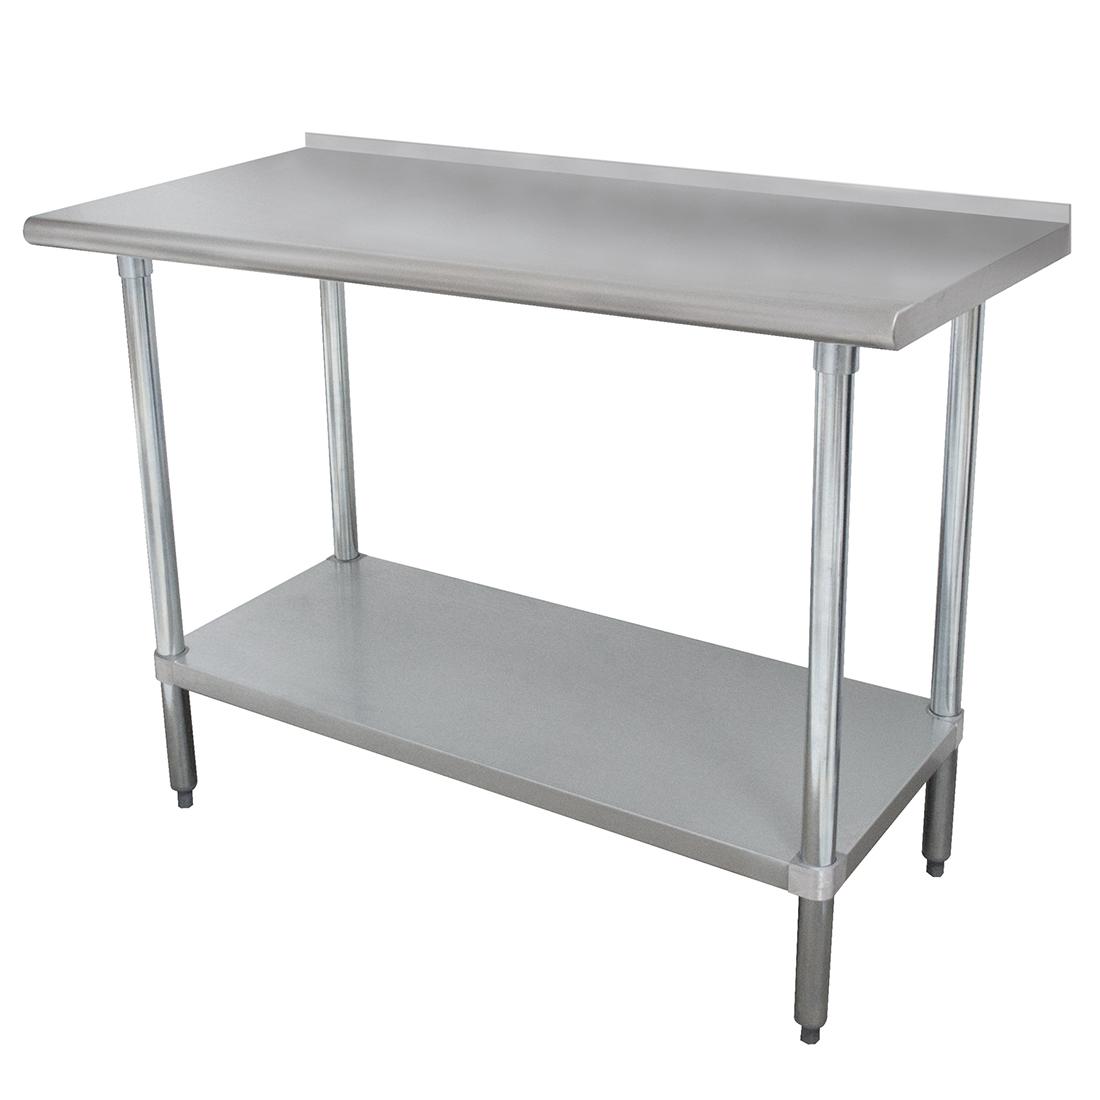 Advance Tabco FLG-303 work table,  36